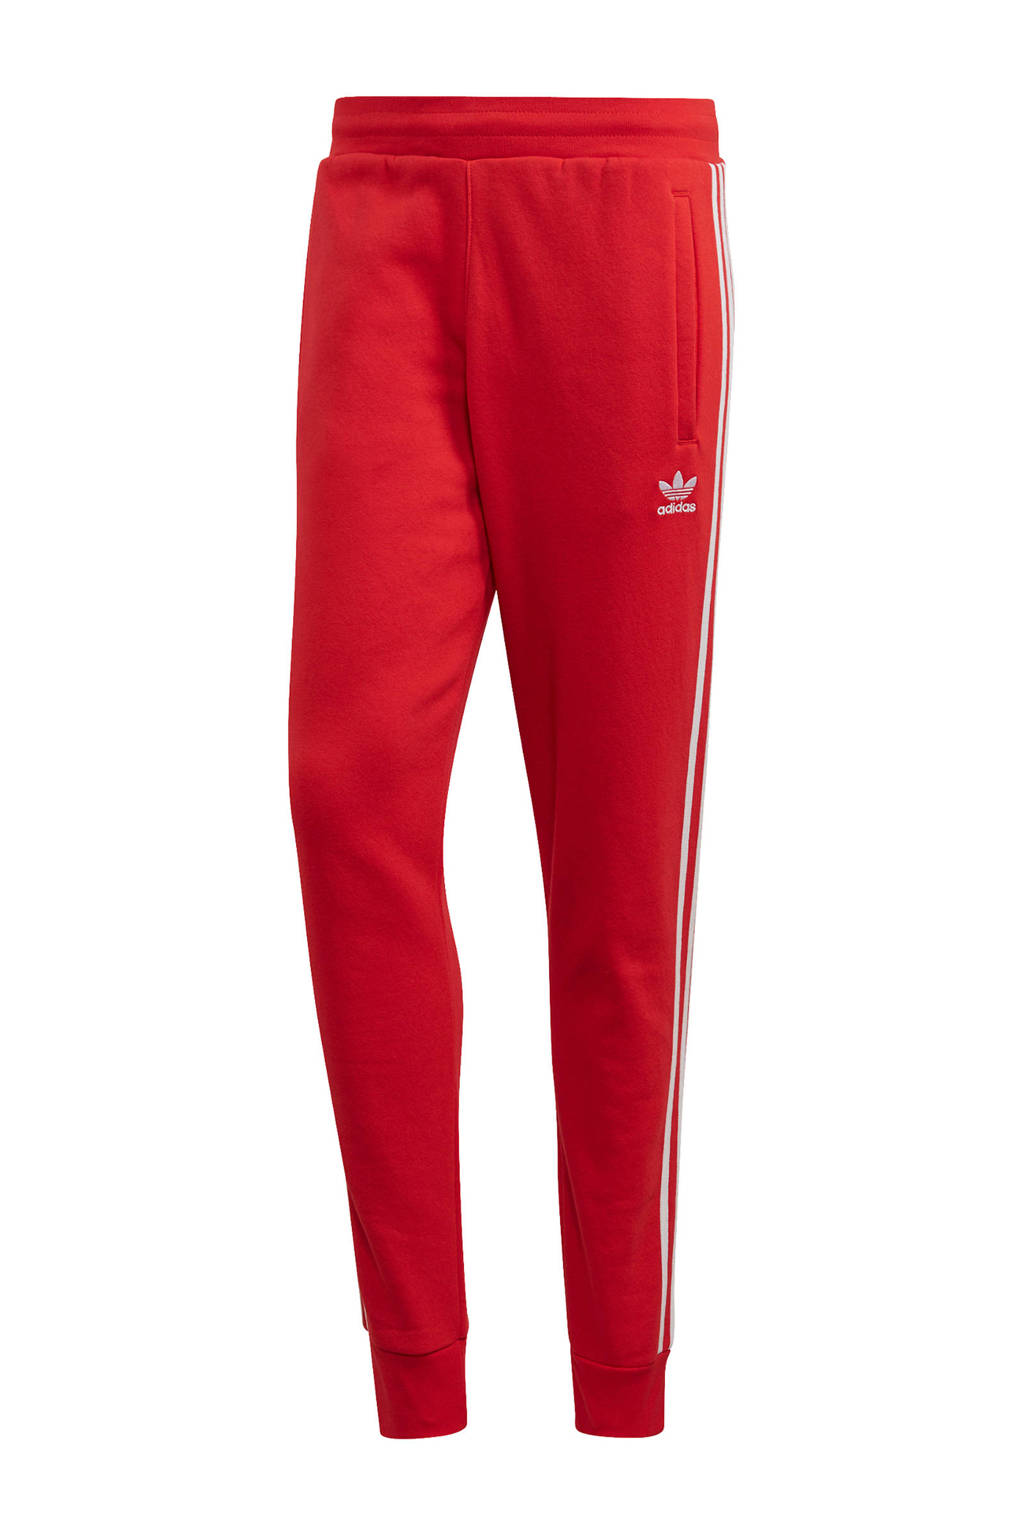 adidas Originals   joggingbroek rood, Rood